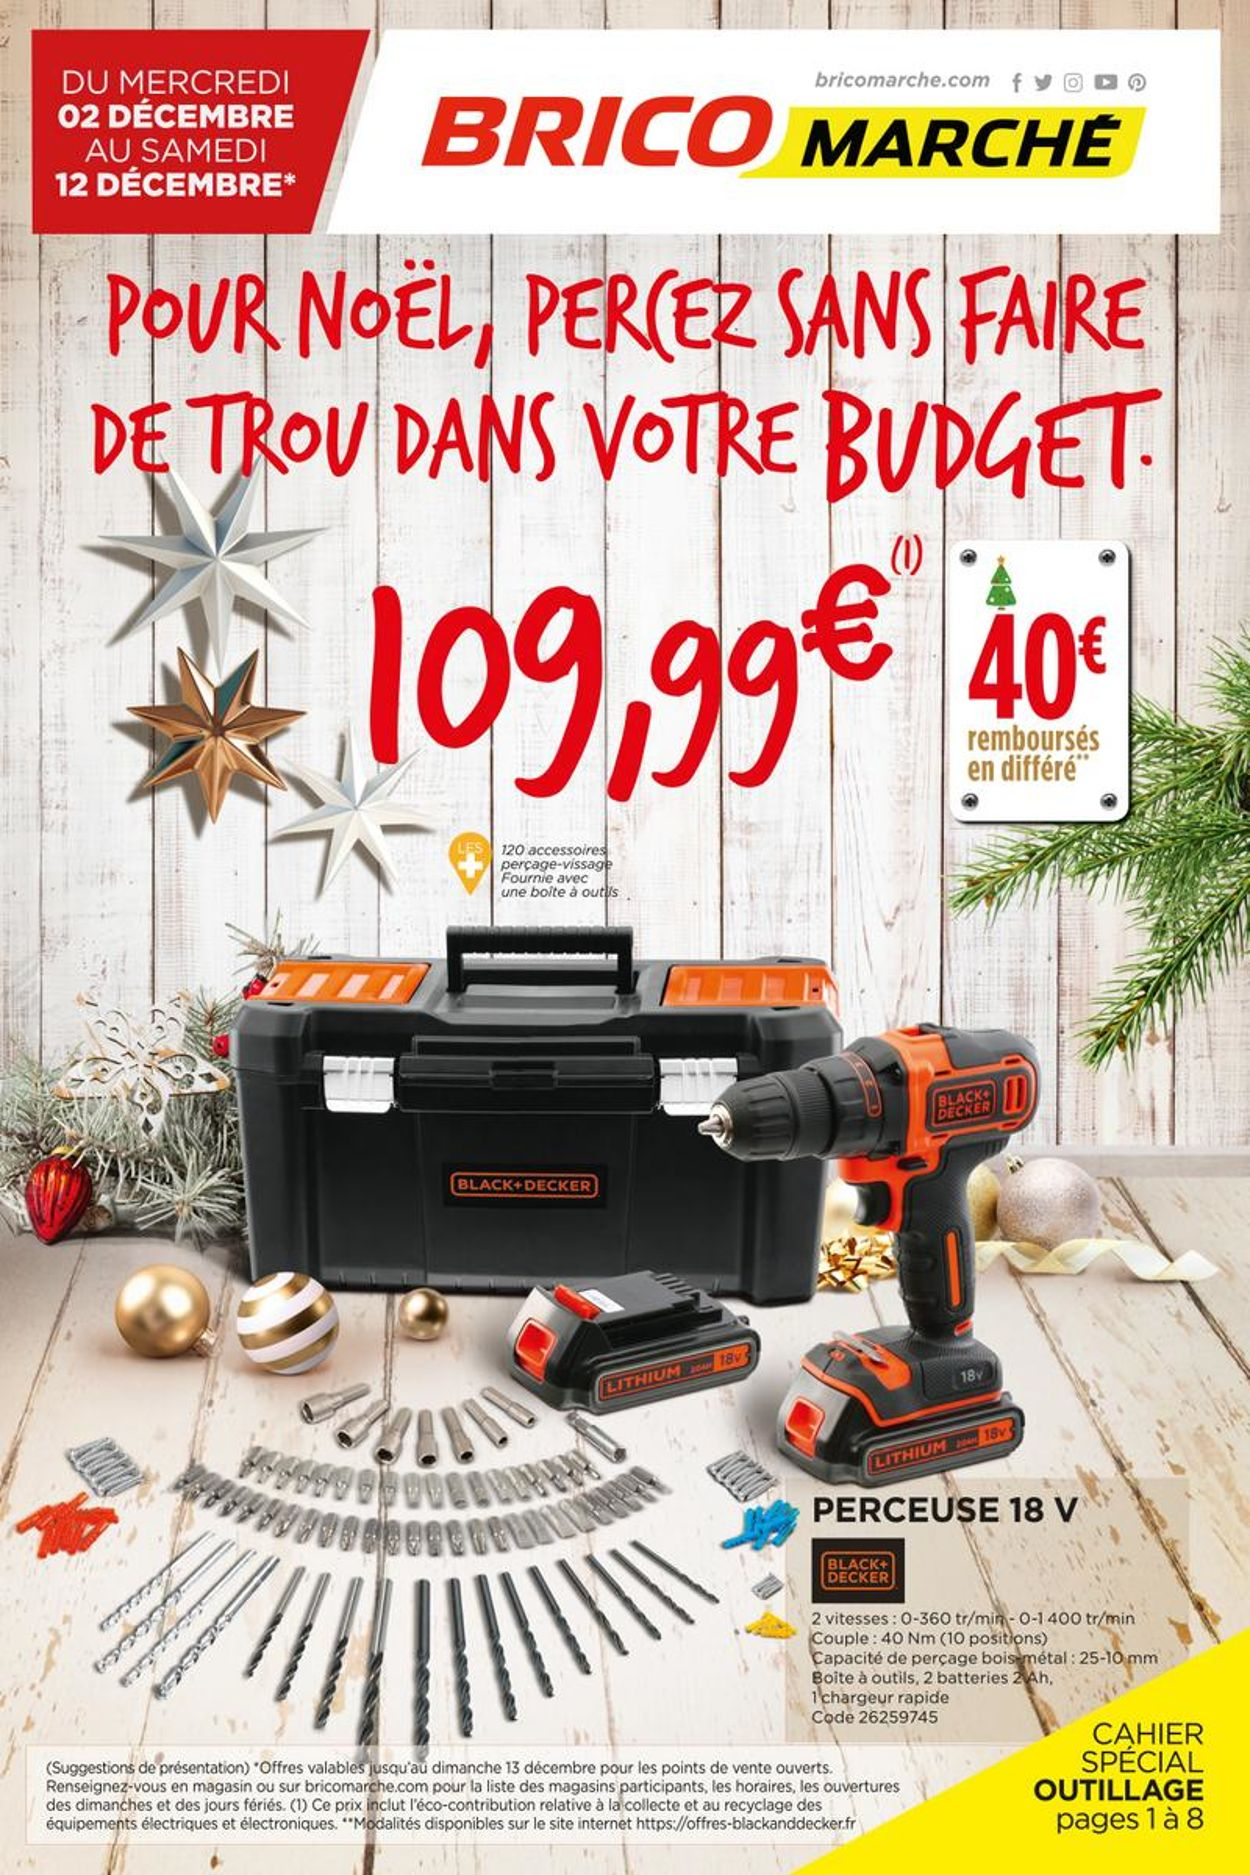 Bricomarché Noel 2020 Catalogue - 02.12-12.12.2020